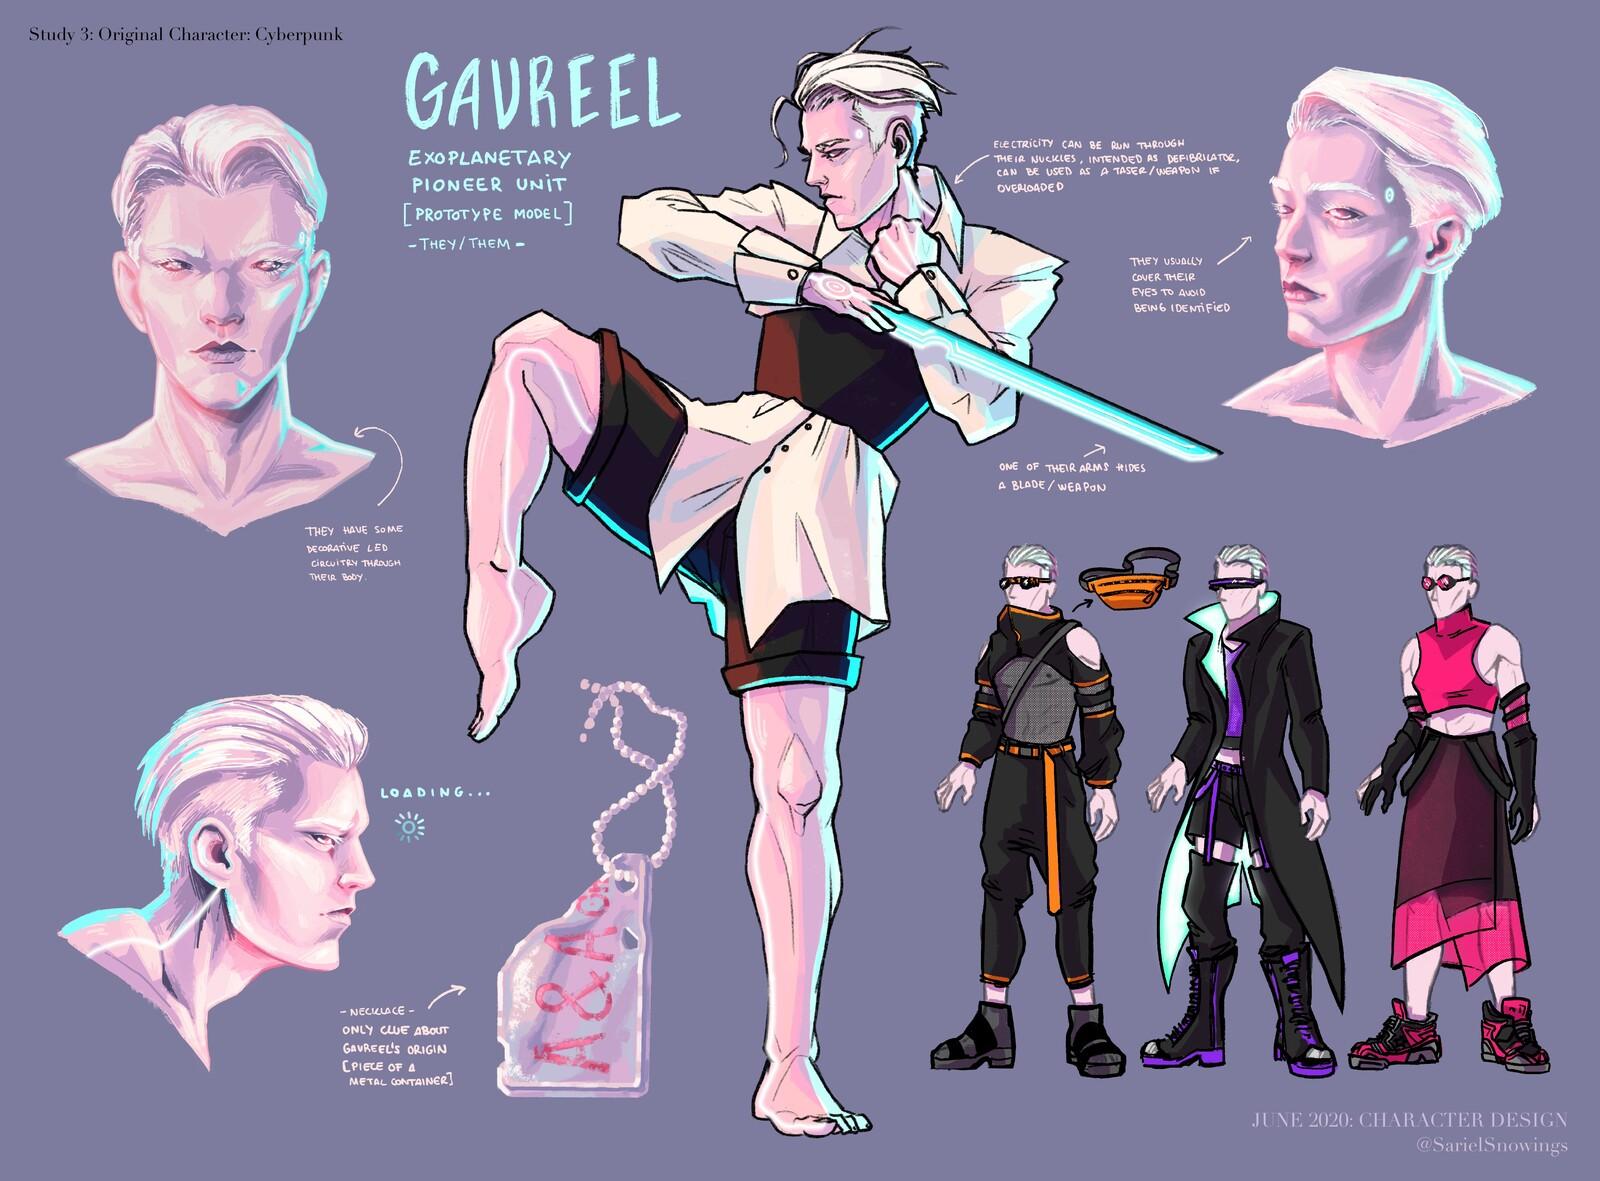 Gavreel - Cyberpunk RPG character art